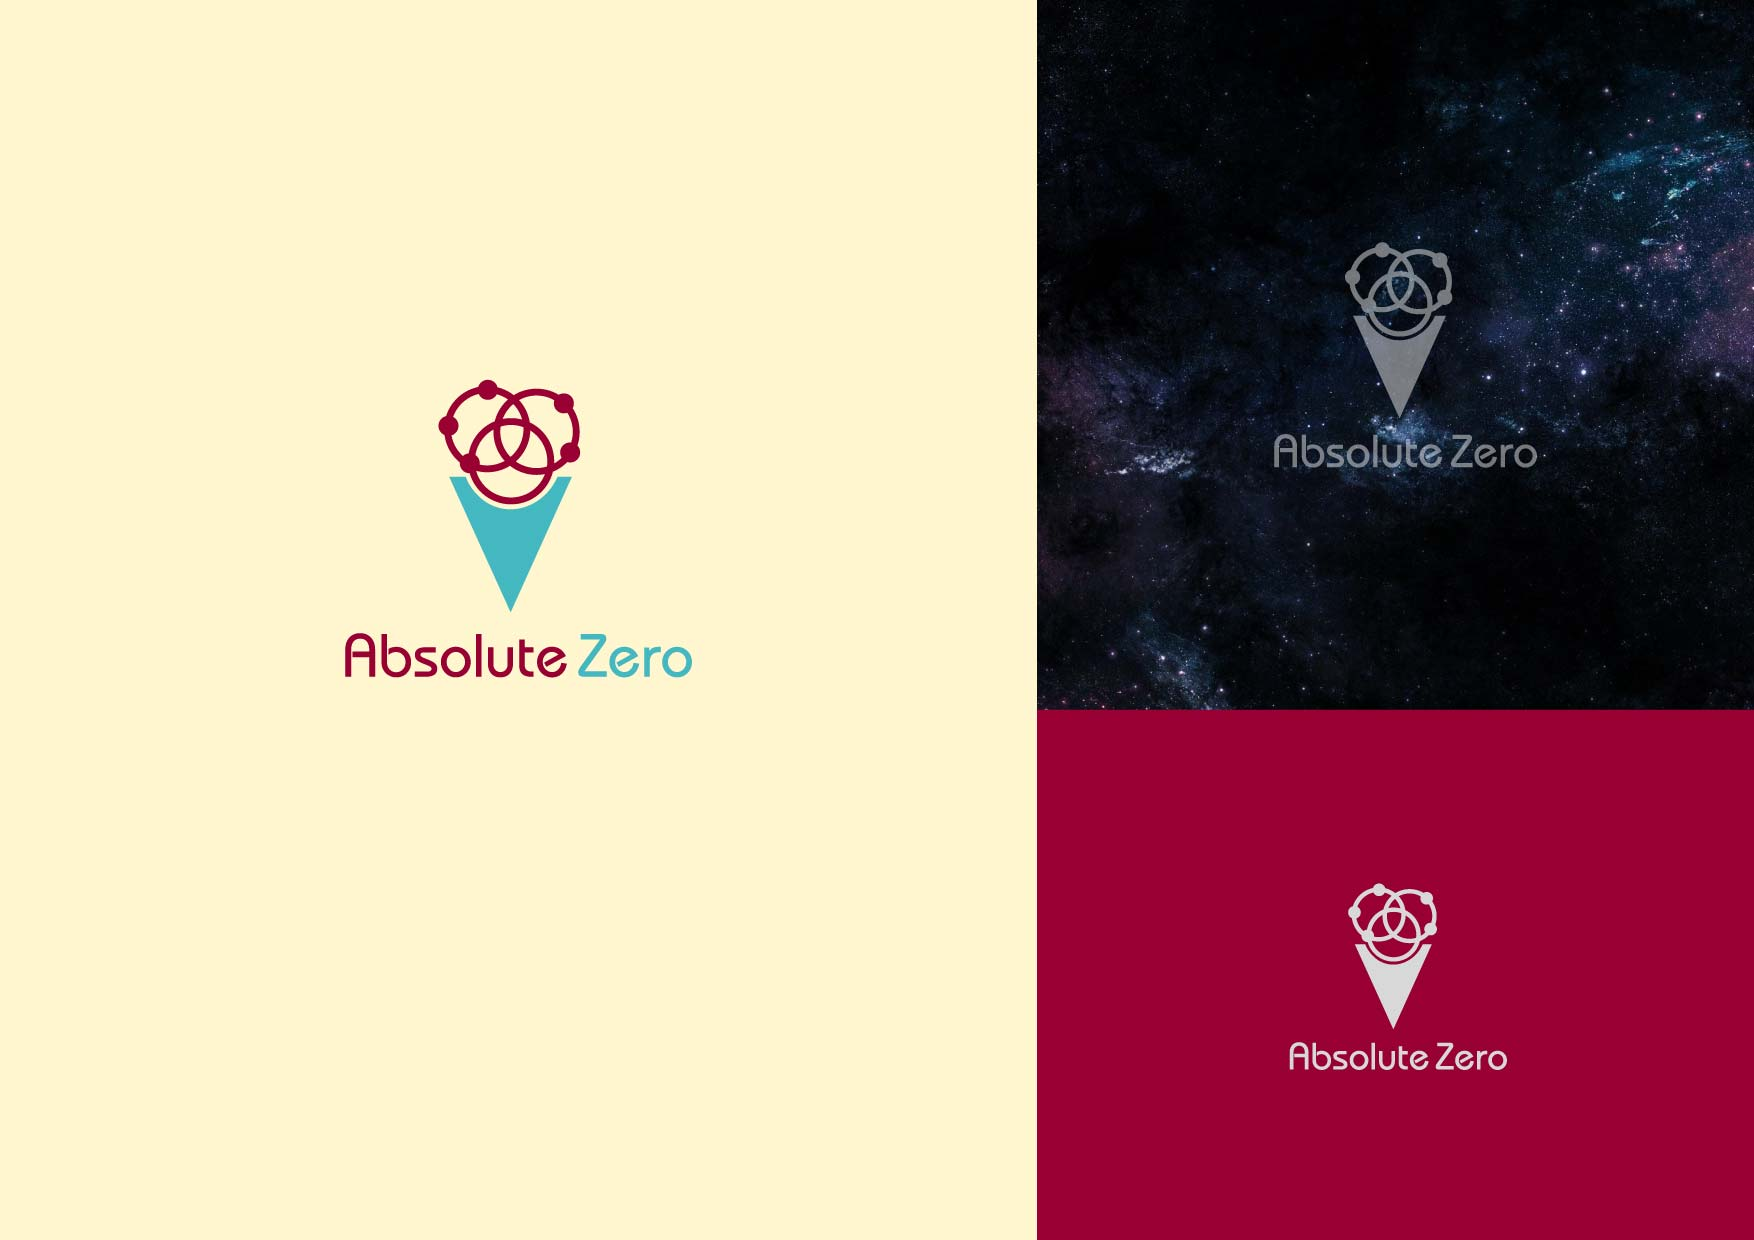 Logo Design by Osi Indra - Entry No. 12 in the Logo Design Contest Imaginative Logo Design for Absolute Zero.